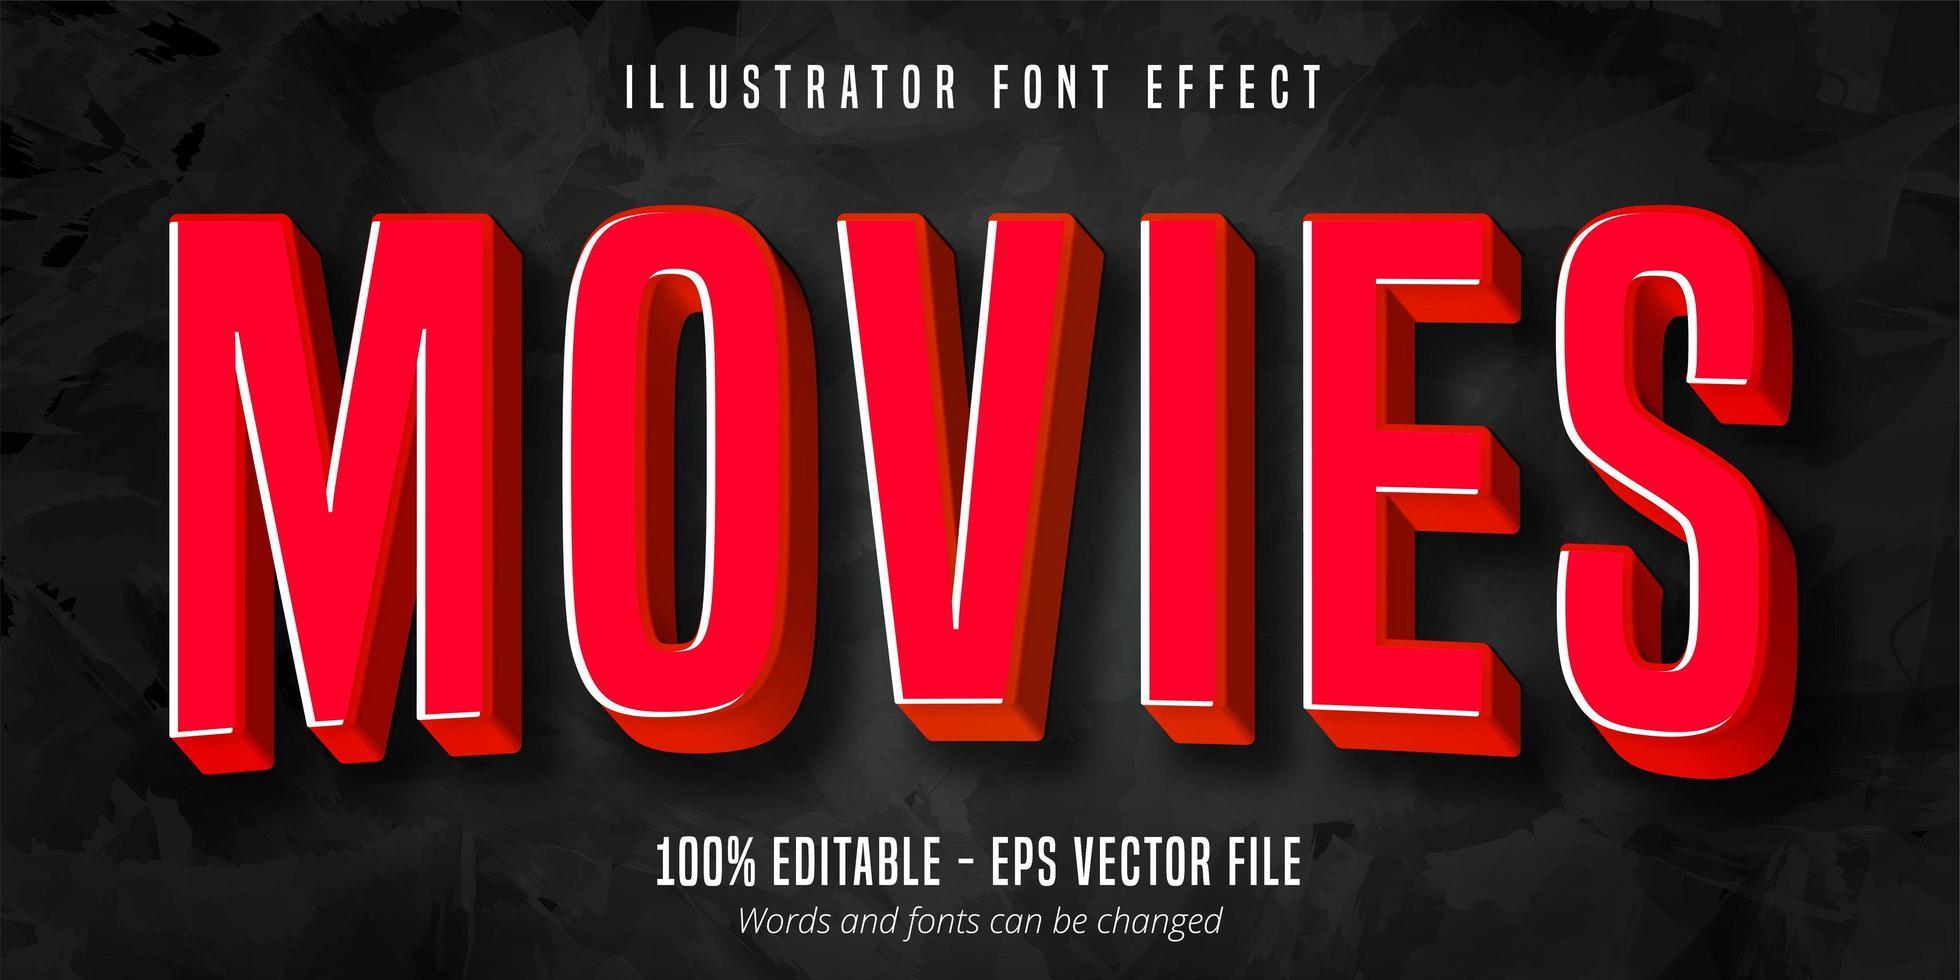 texto de películas, efecto de fuente editable estilo película roja 3d vector